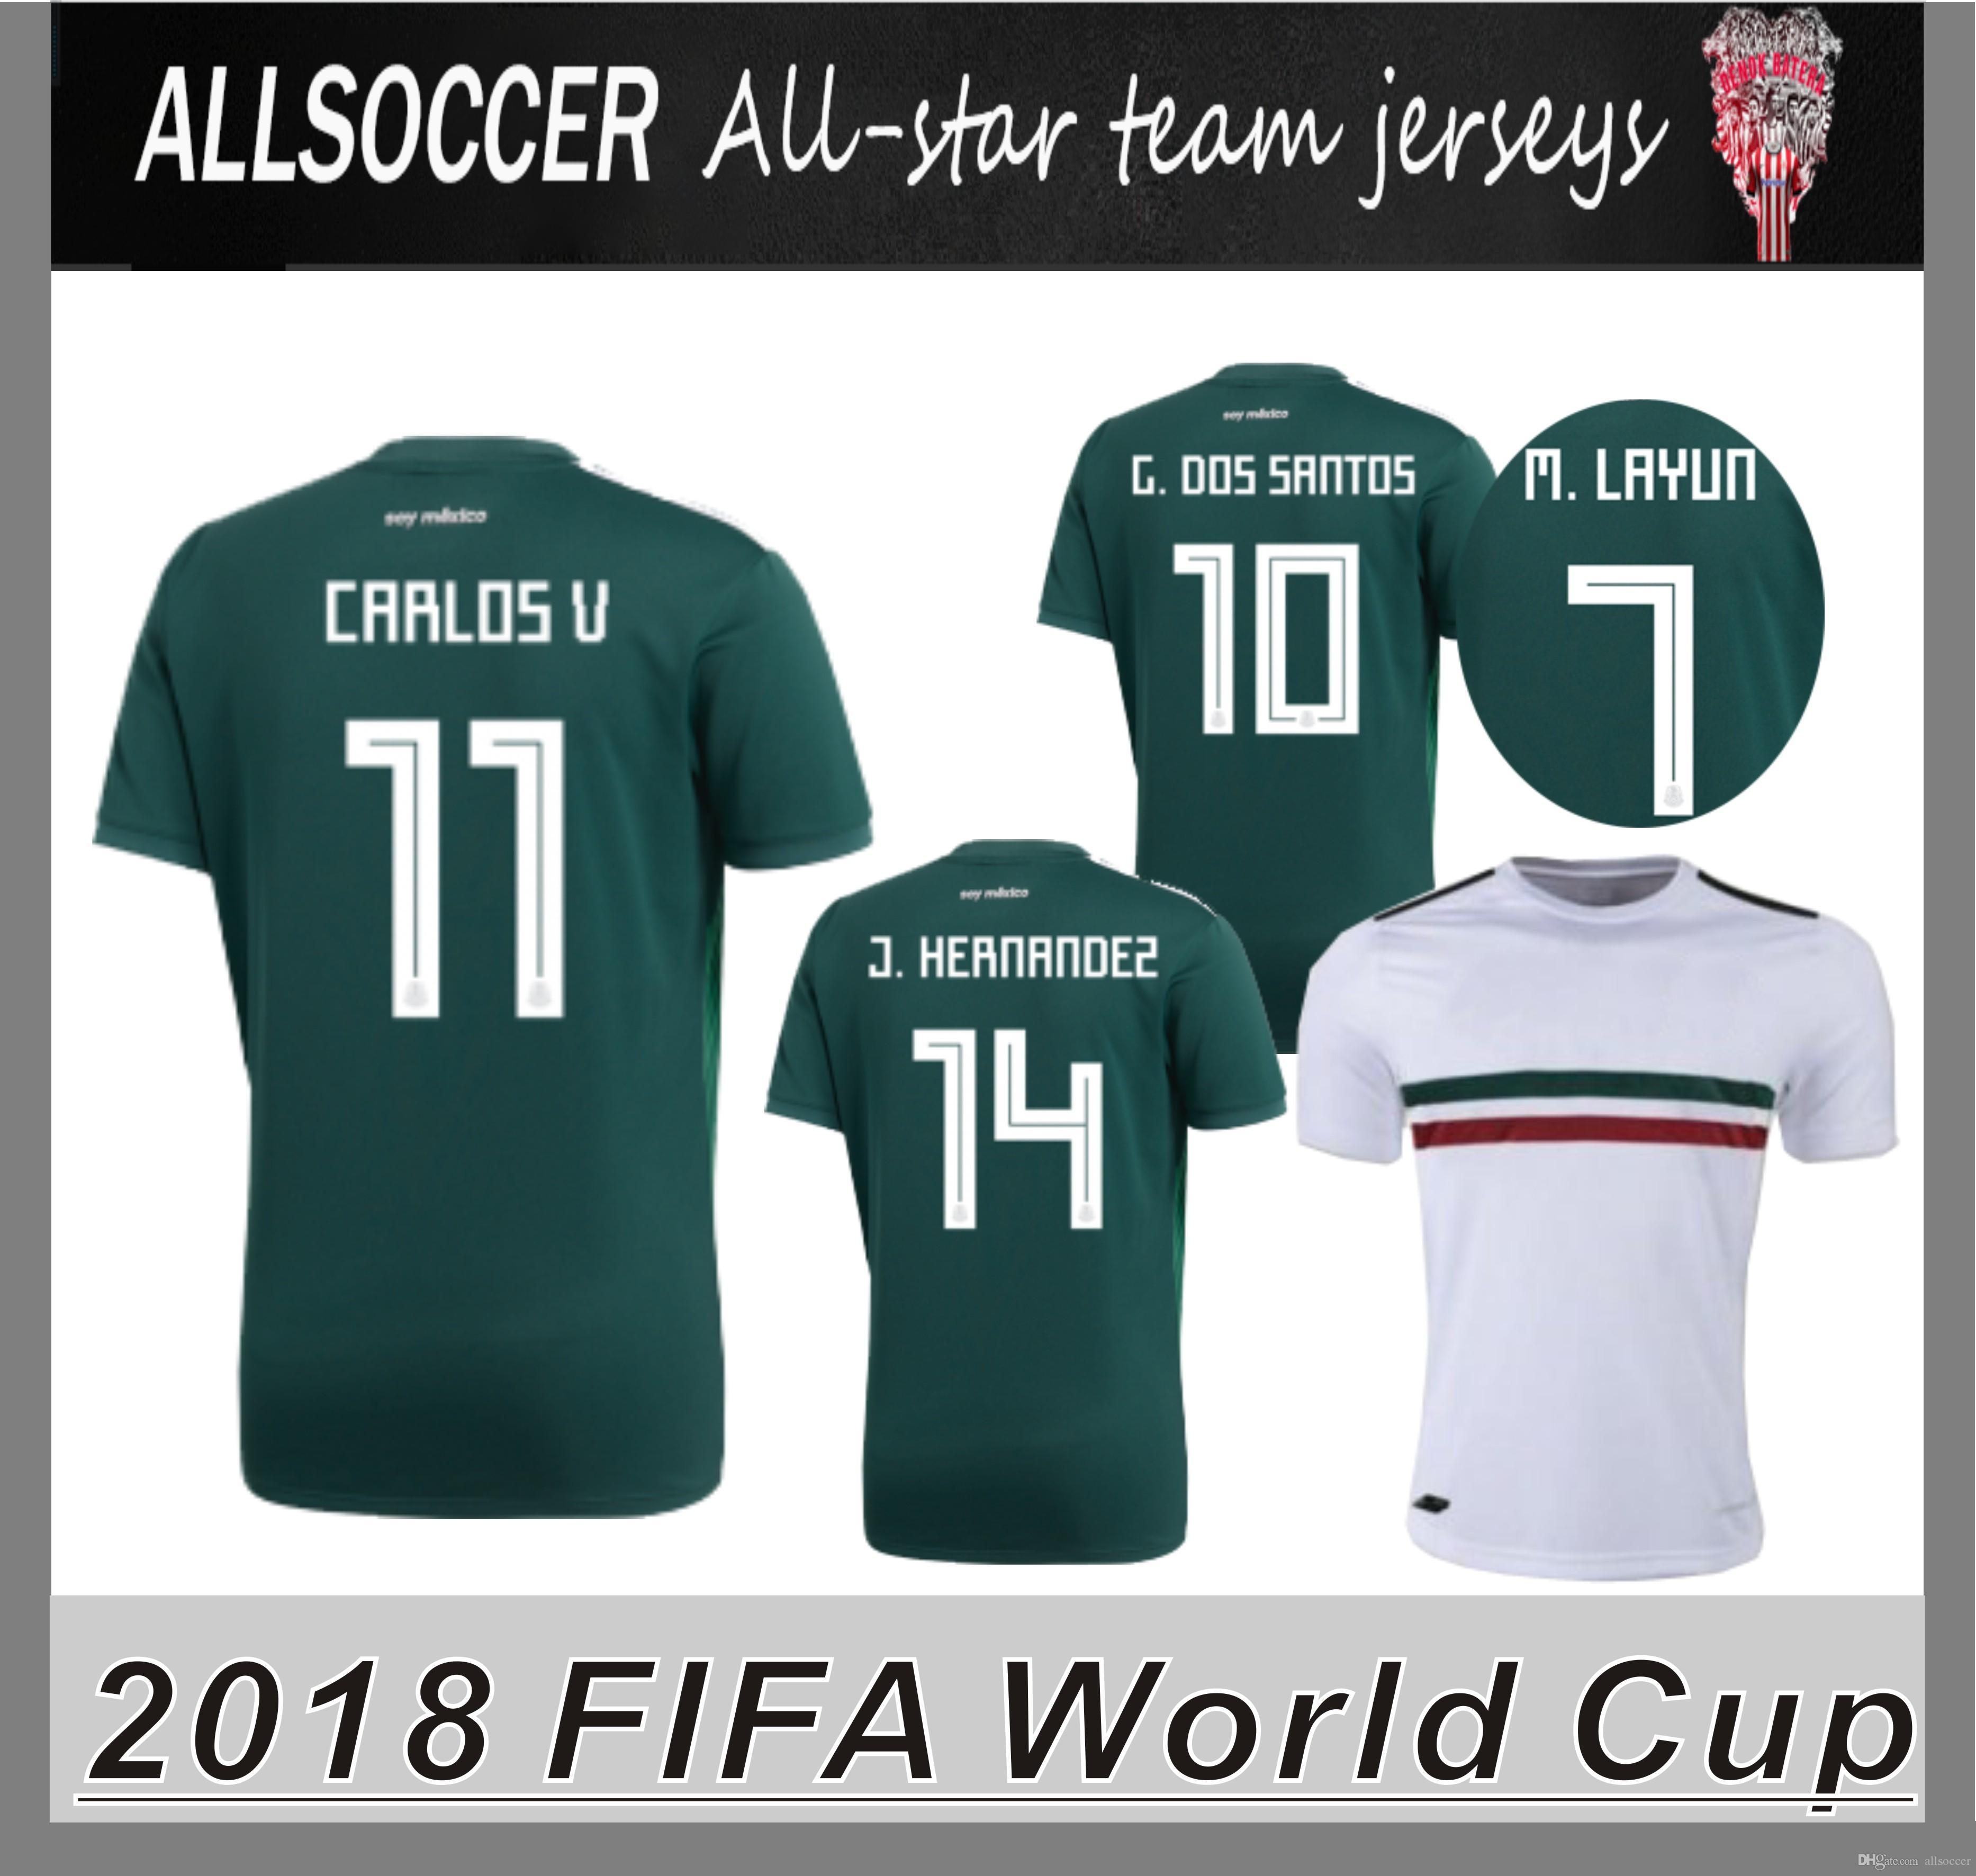 8e29ddf2a 2019 TOP QUALITY 2018 World Cup Jerseys Mexico SOCCER JERSEYS MARQUEZ  Chicharito Miguel Layun Hector Herrera Giovani Dos Santos Carlos Vela From  Allsoccer